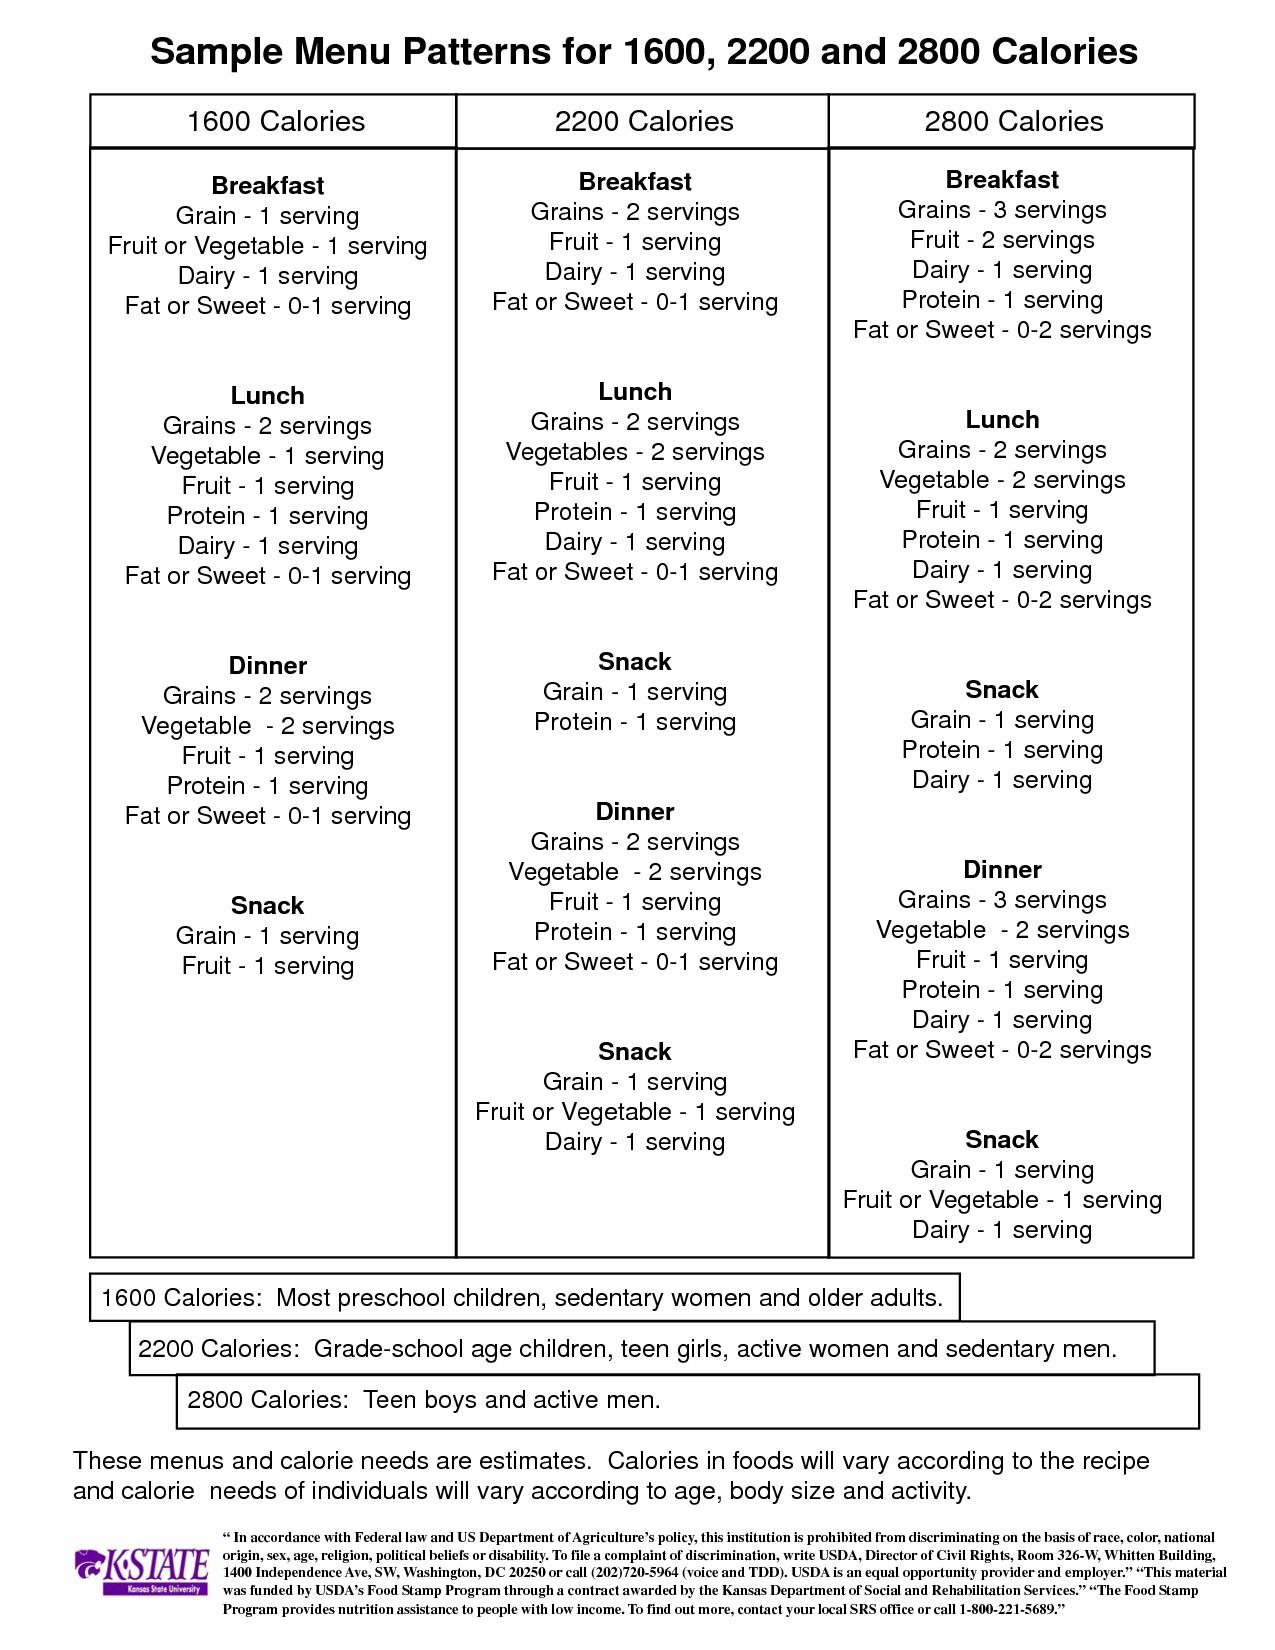 Sample Menu Patterns For And Calories